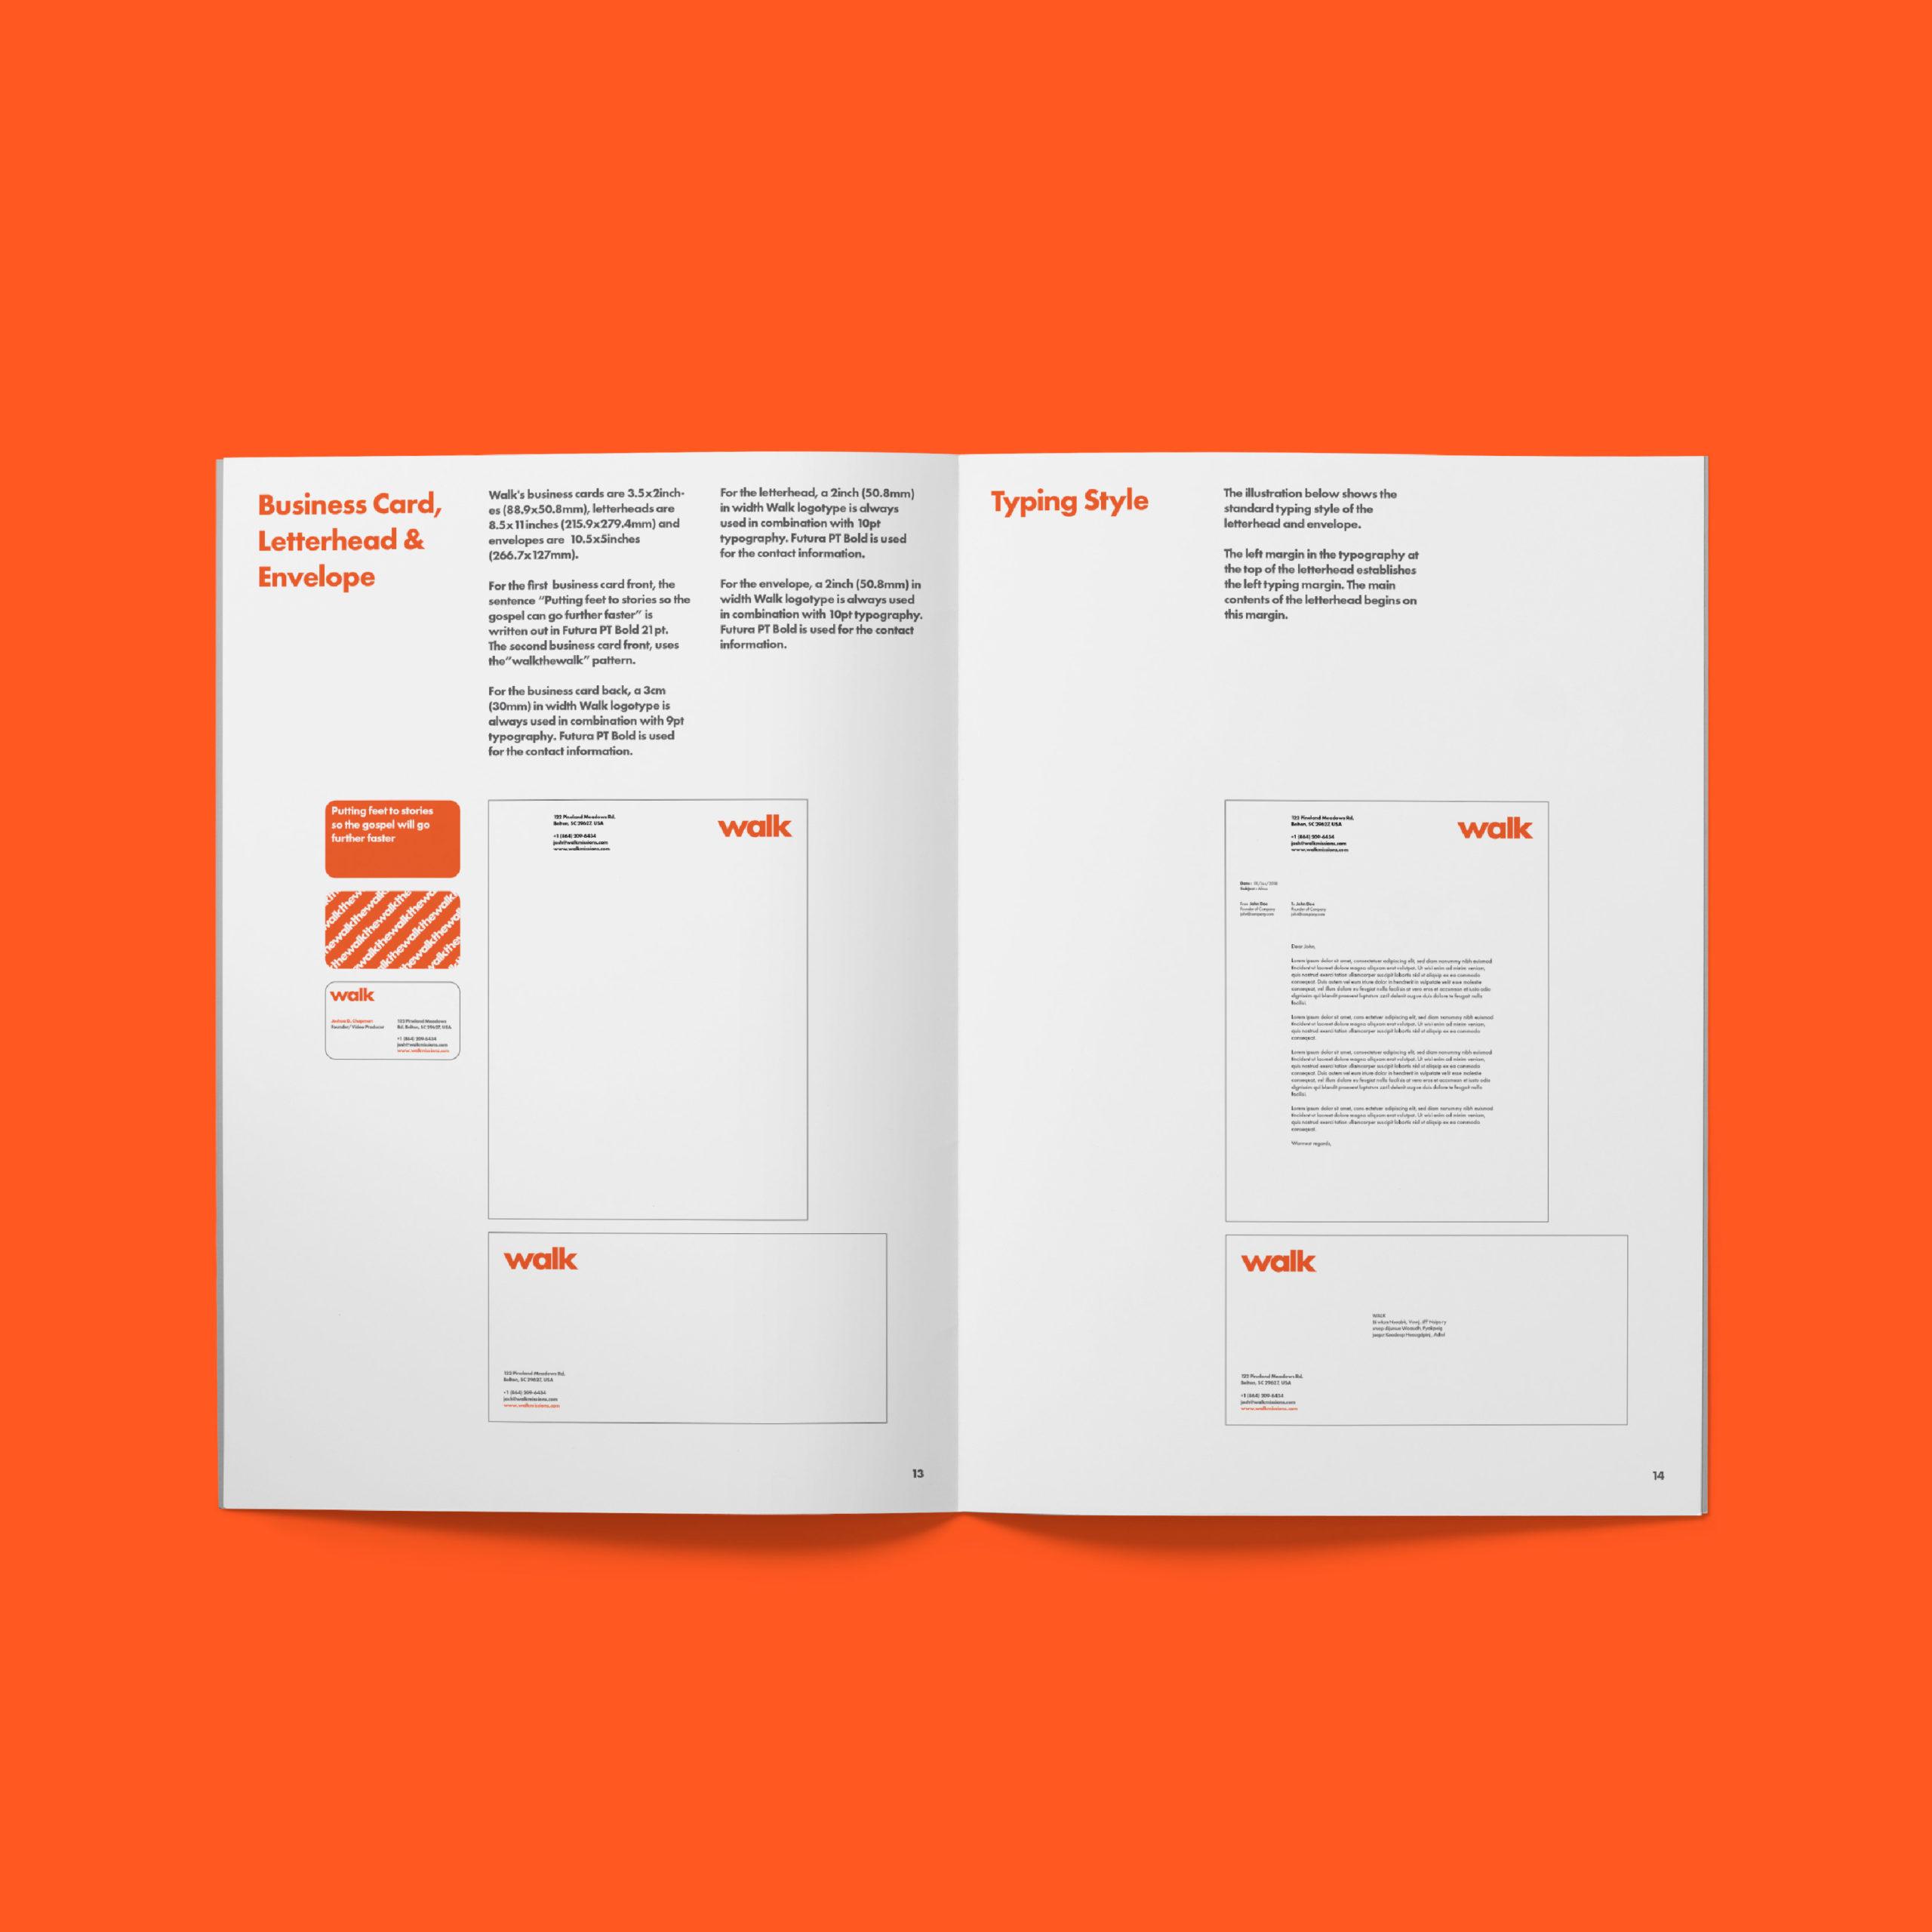 Walk-Missions-Brand-Identity-Design_14